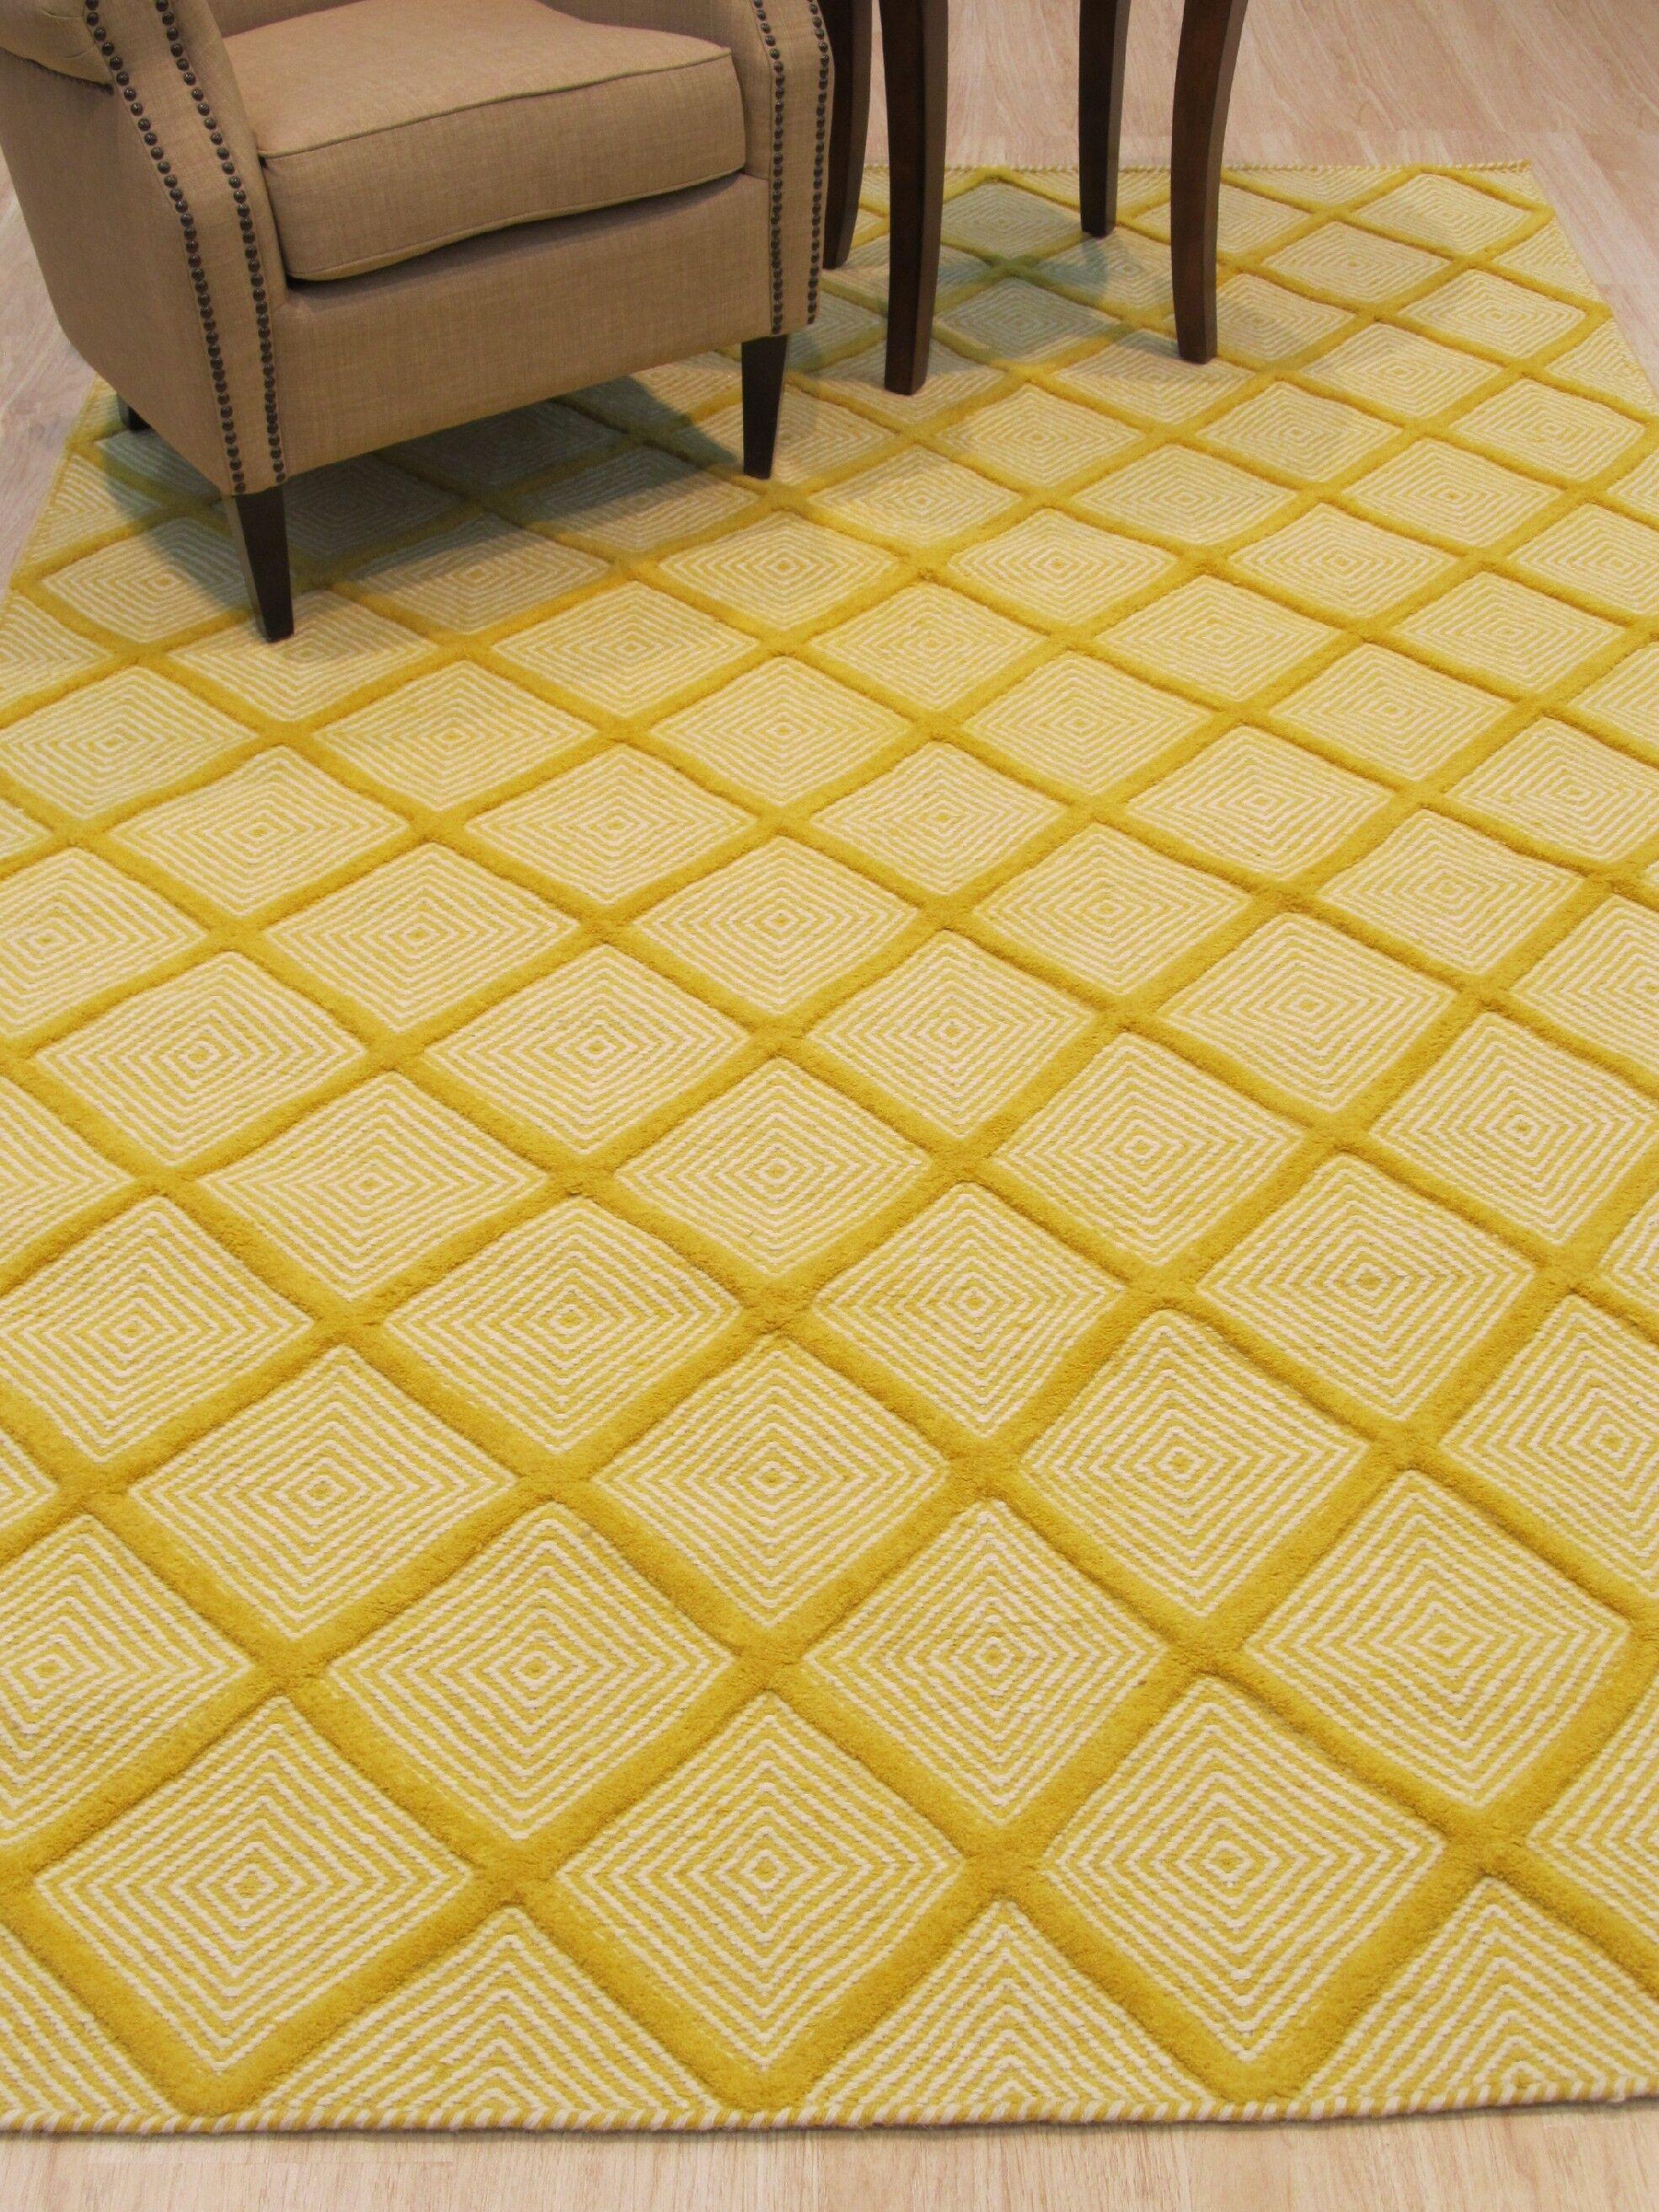 Willman Hand-Woven Wool Yellow Area Rug Rug Size: 8' x 10'